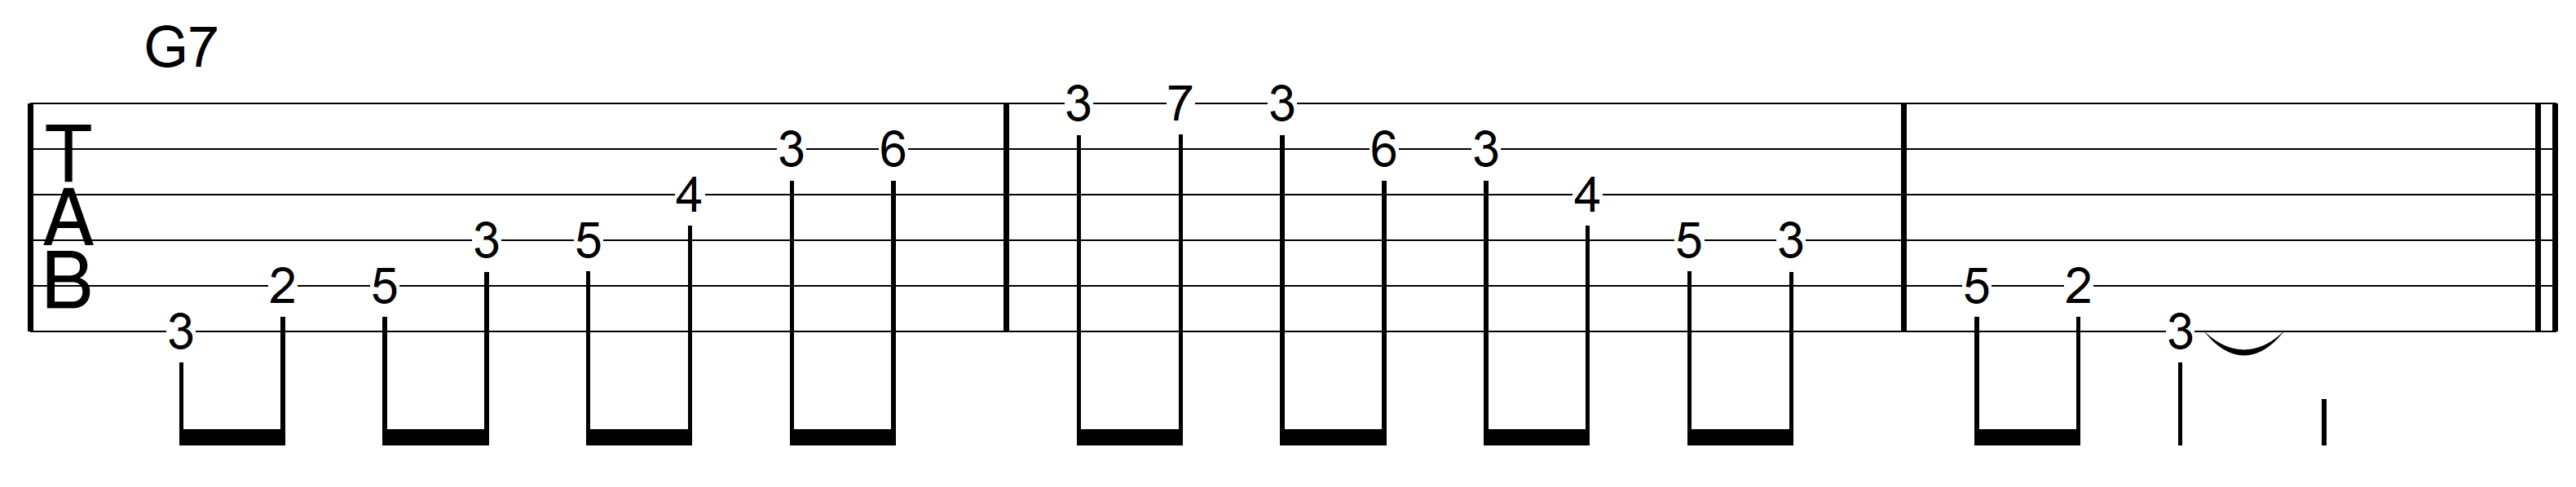 Guitar Arpeggio G7 Asc Desc